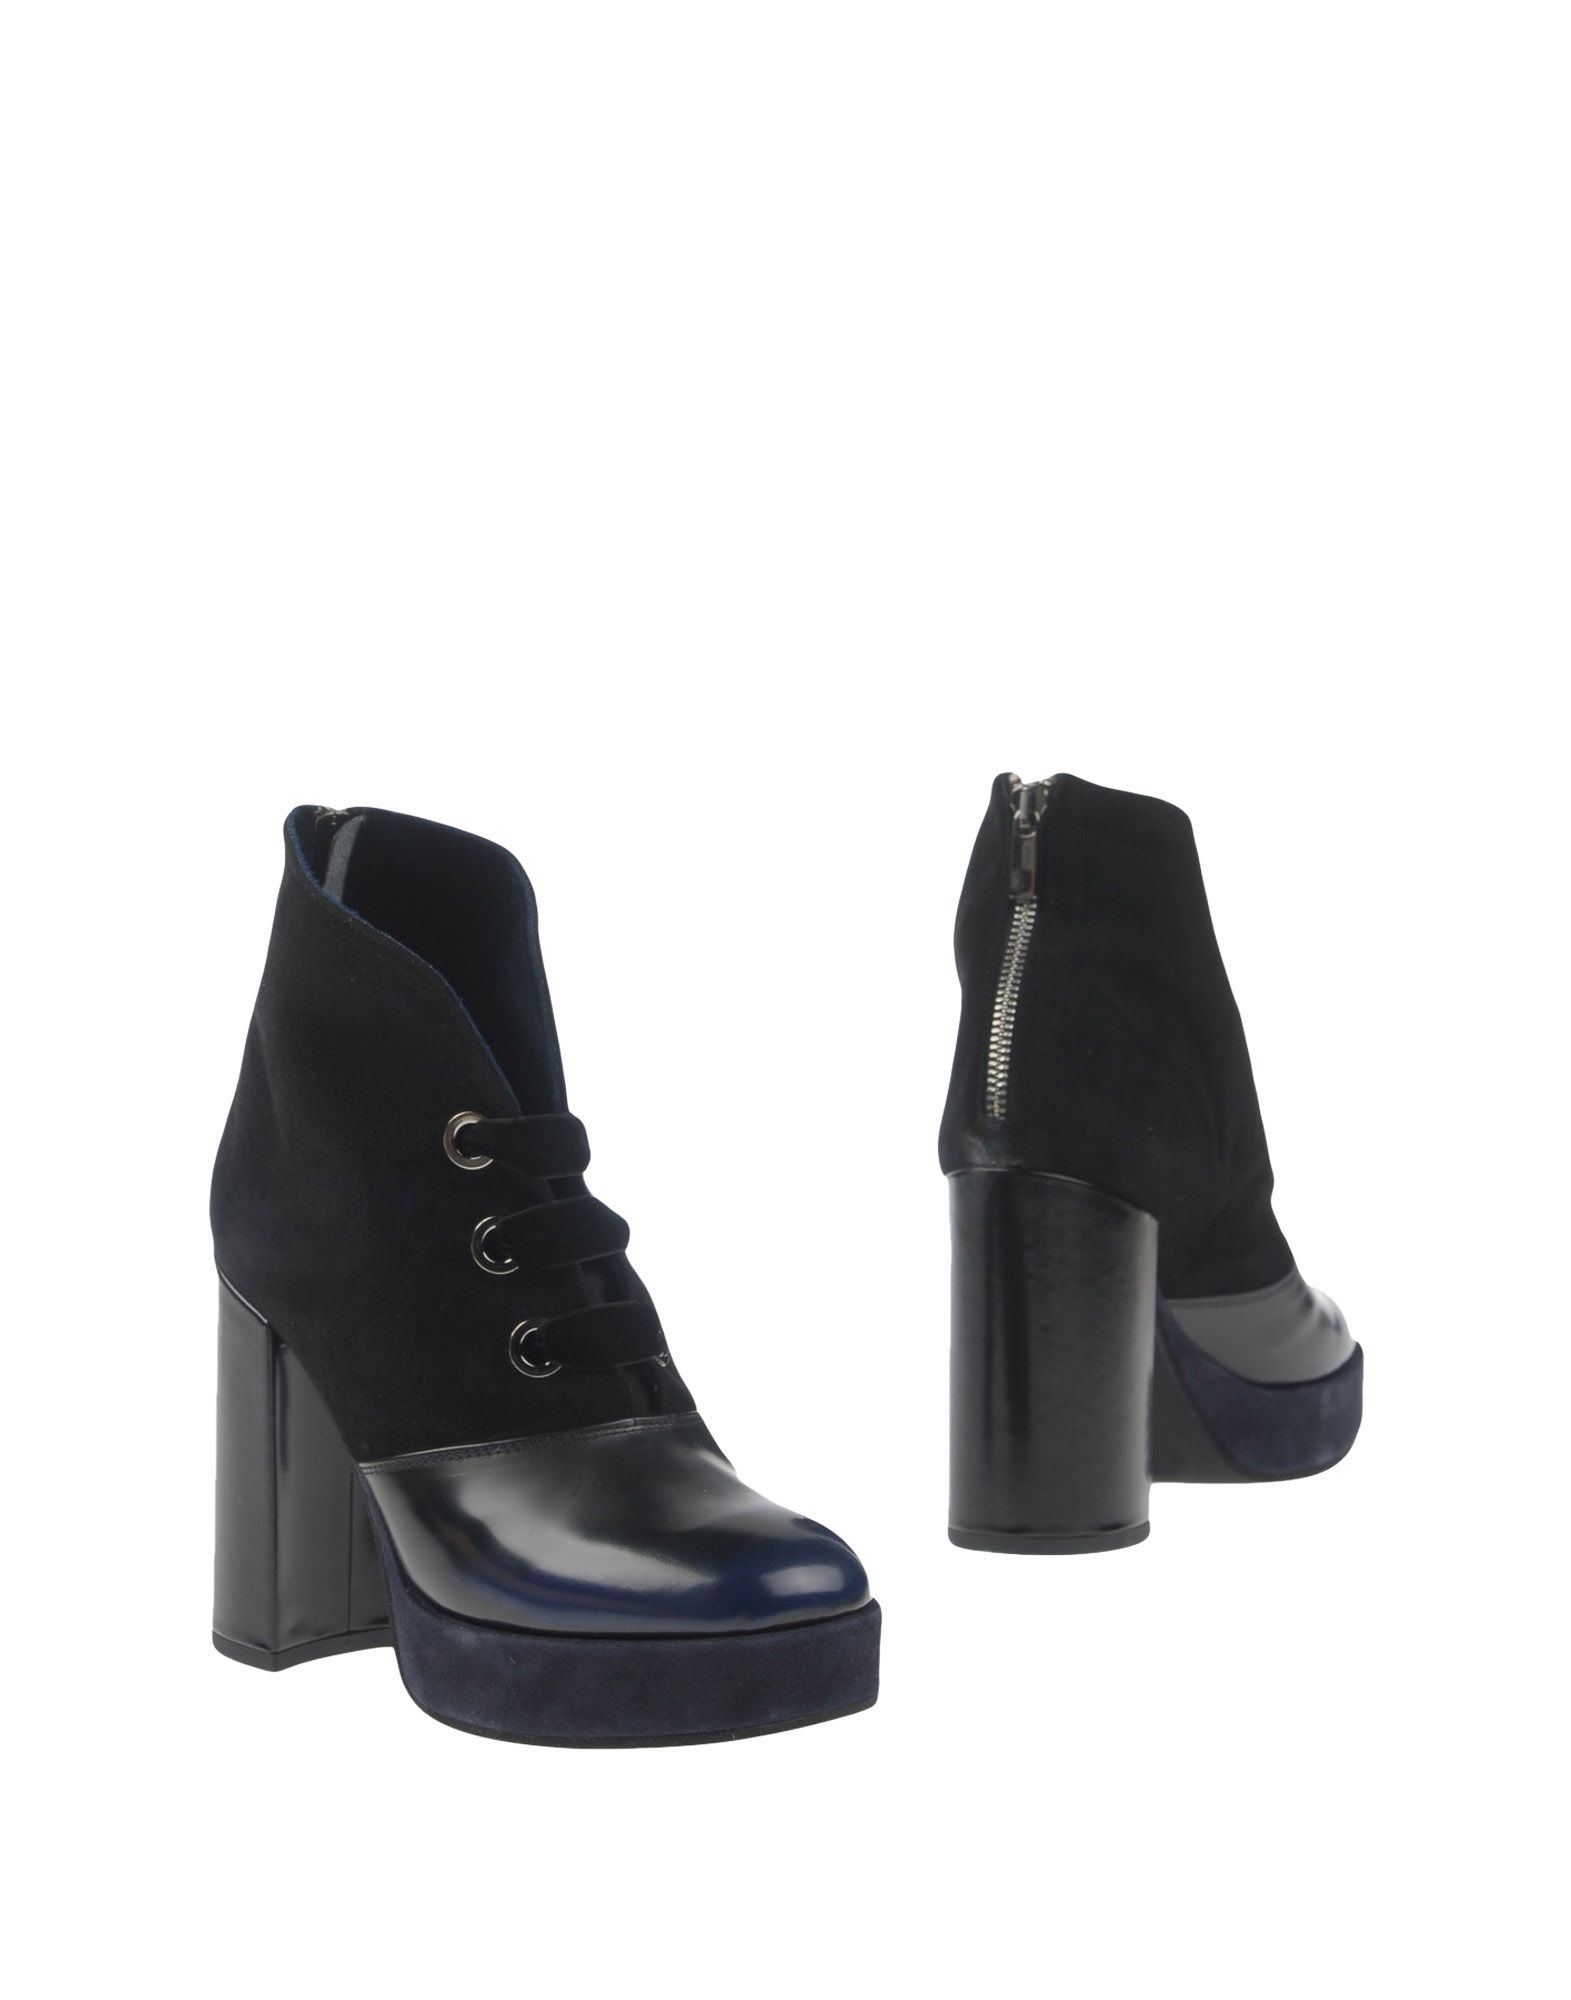 Tipe E Tacchi Stiefelette Damen  11286313TV Gute Qualität beliebte Schuhe